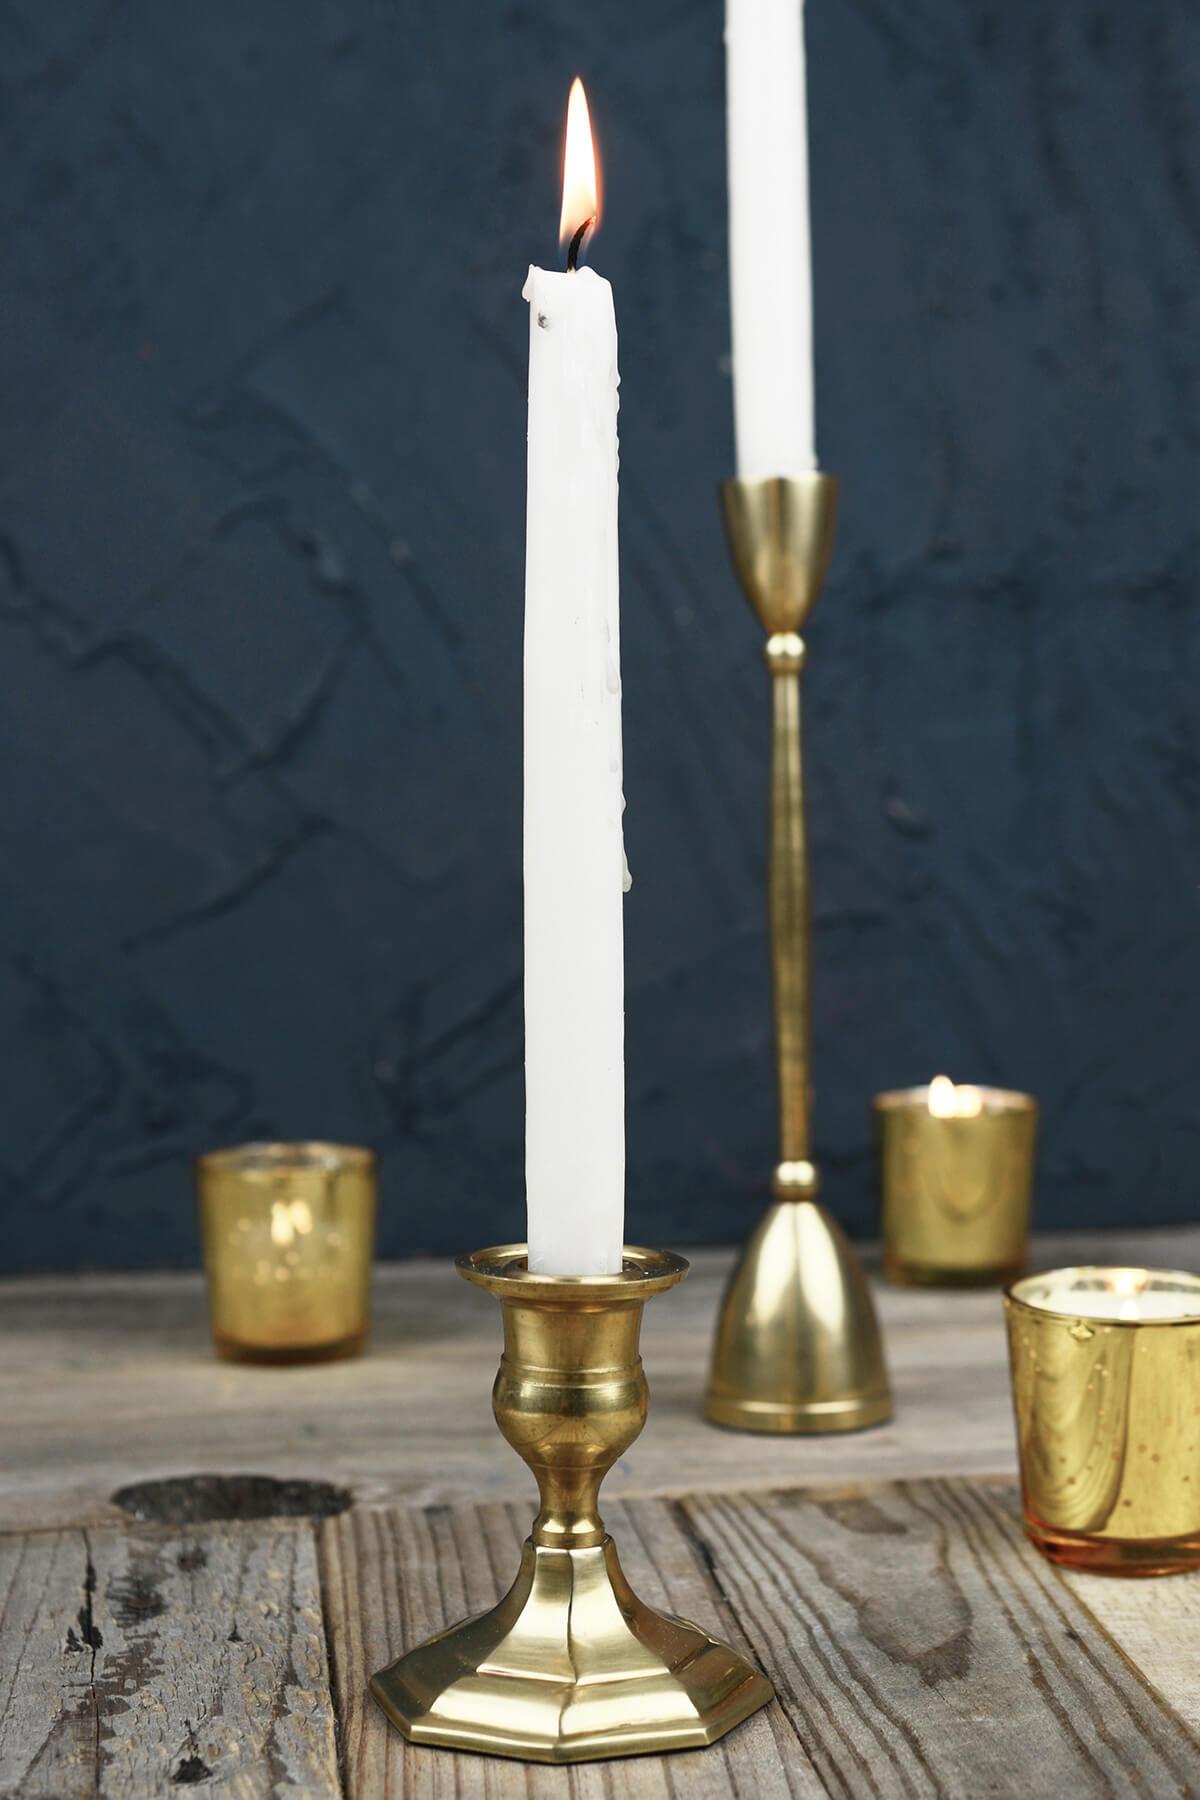 "Gold Metal 3"" Taper Candle Holder, Antique Candlestick"